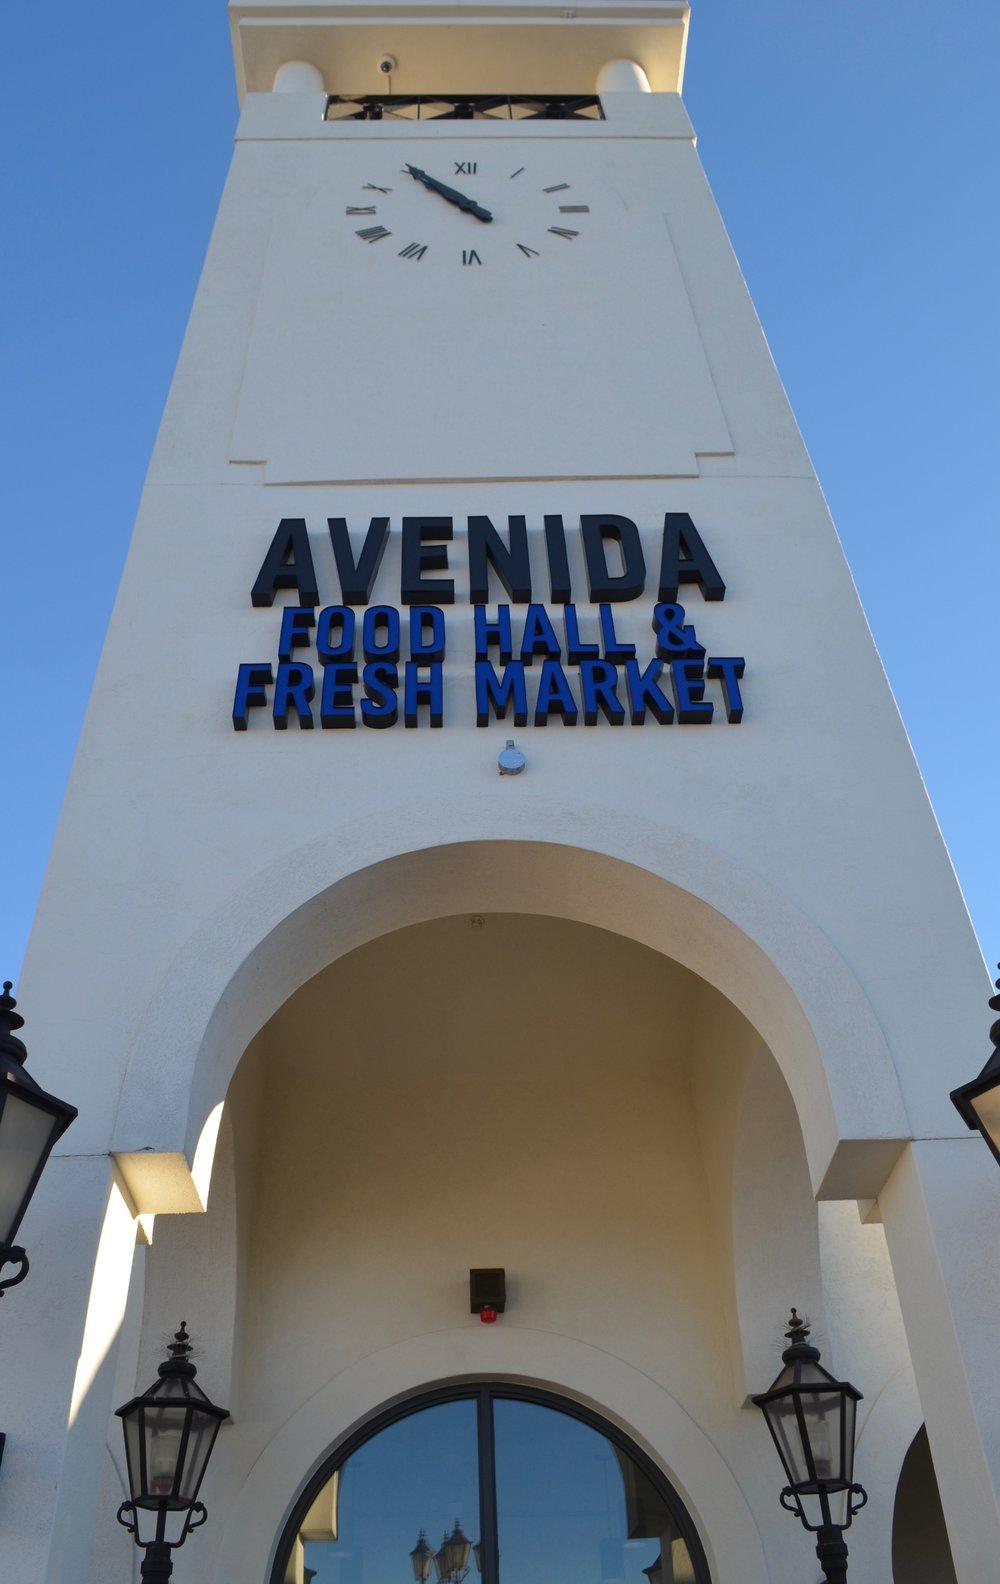 PHOTO: AVENIDA FOOD HALL